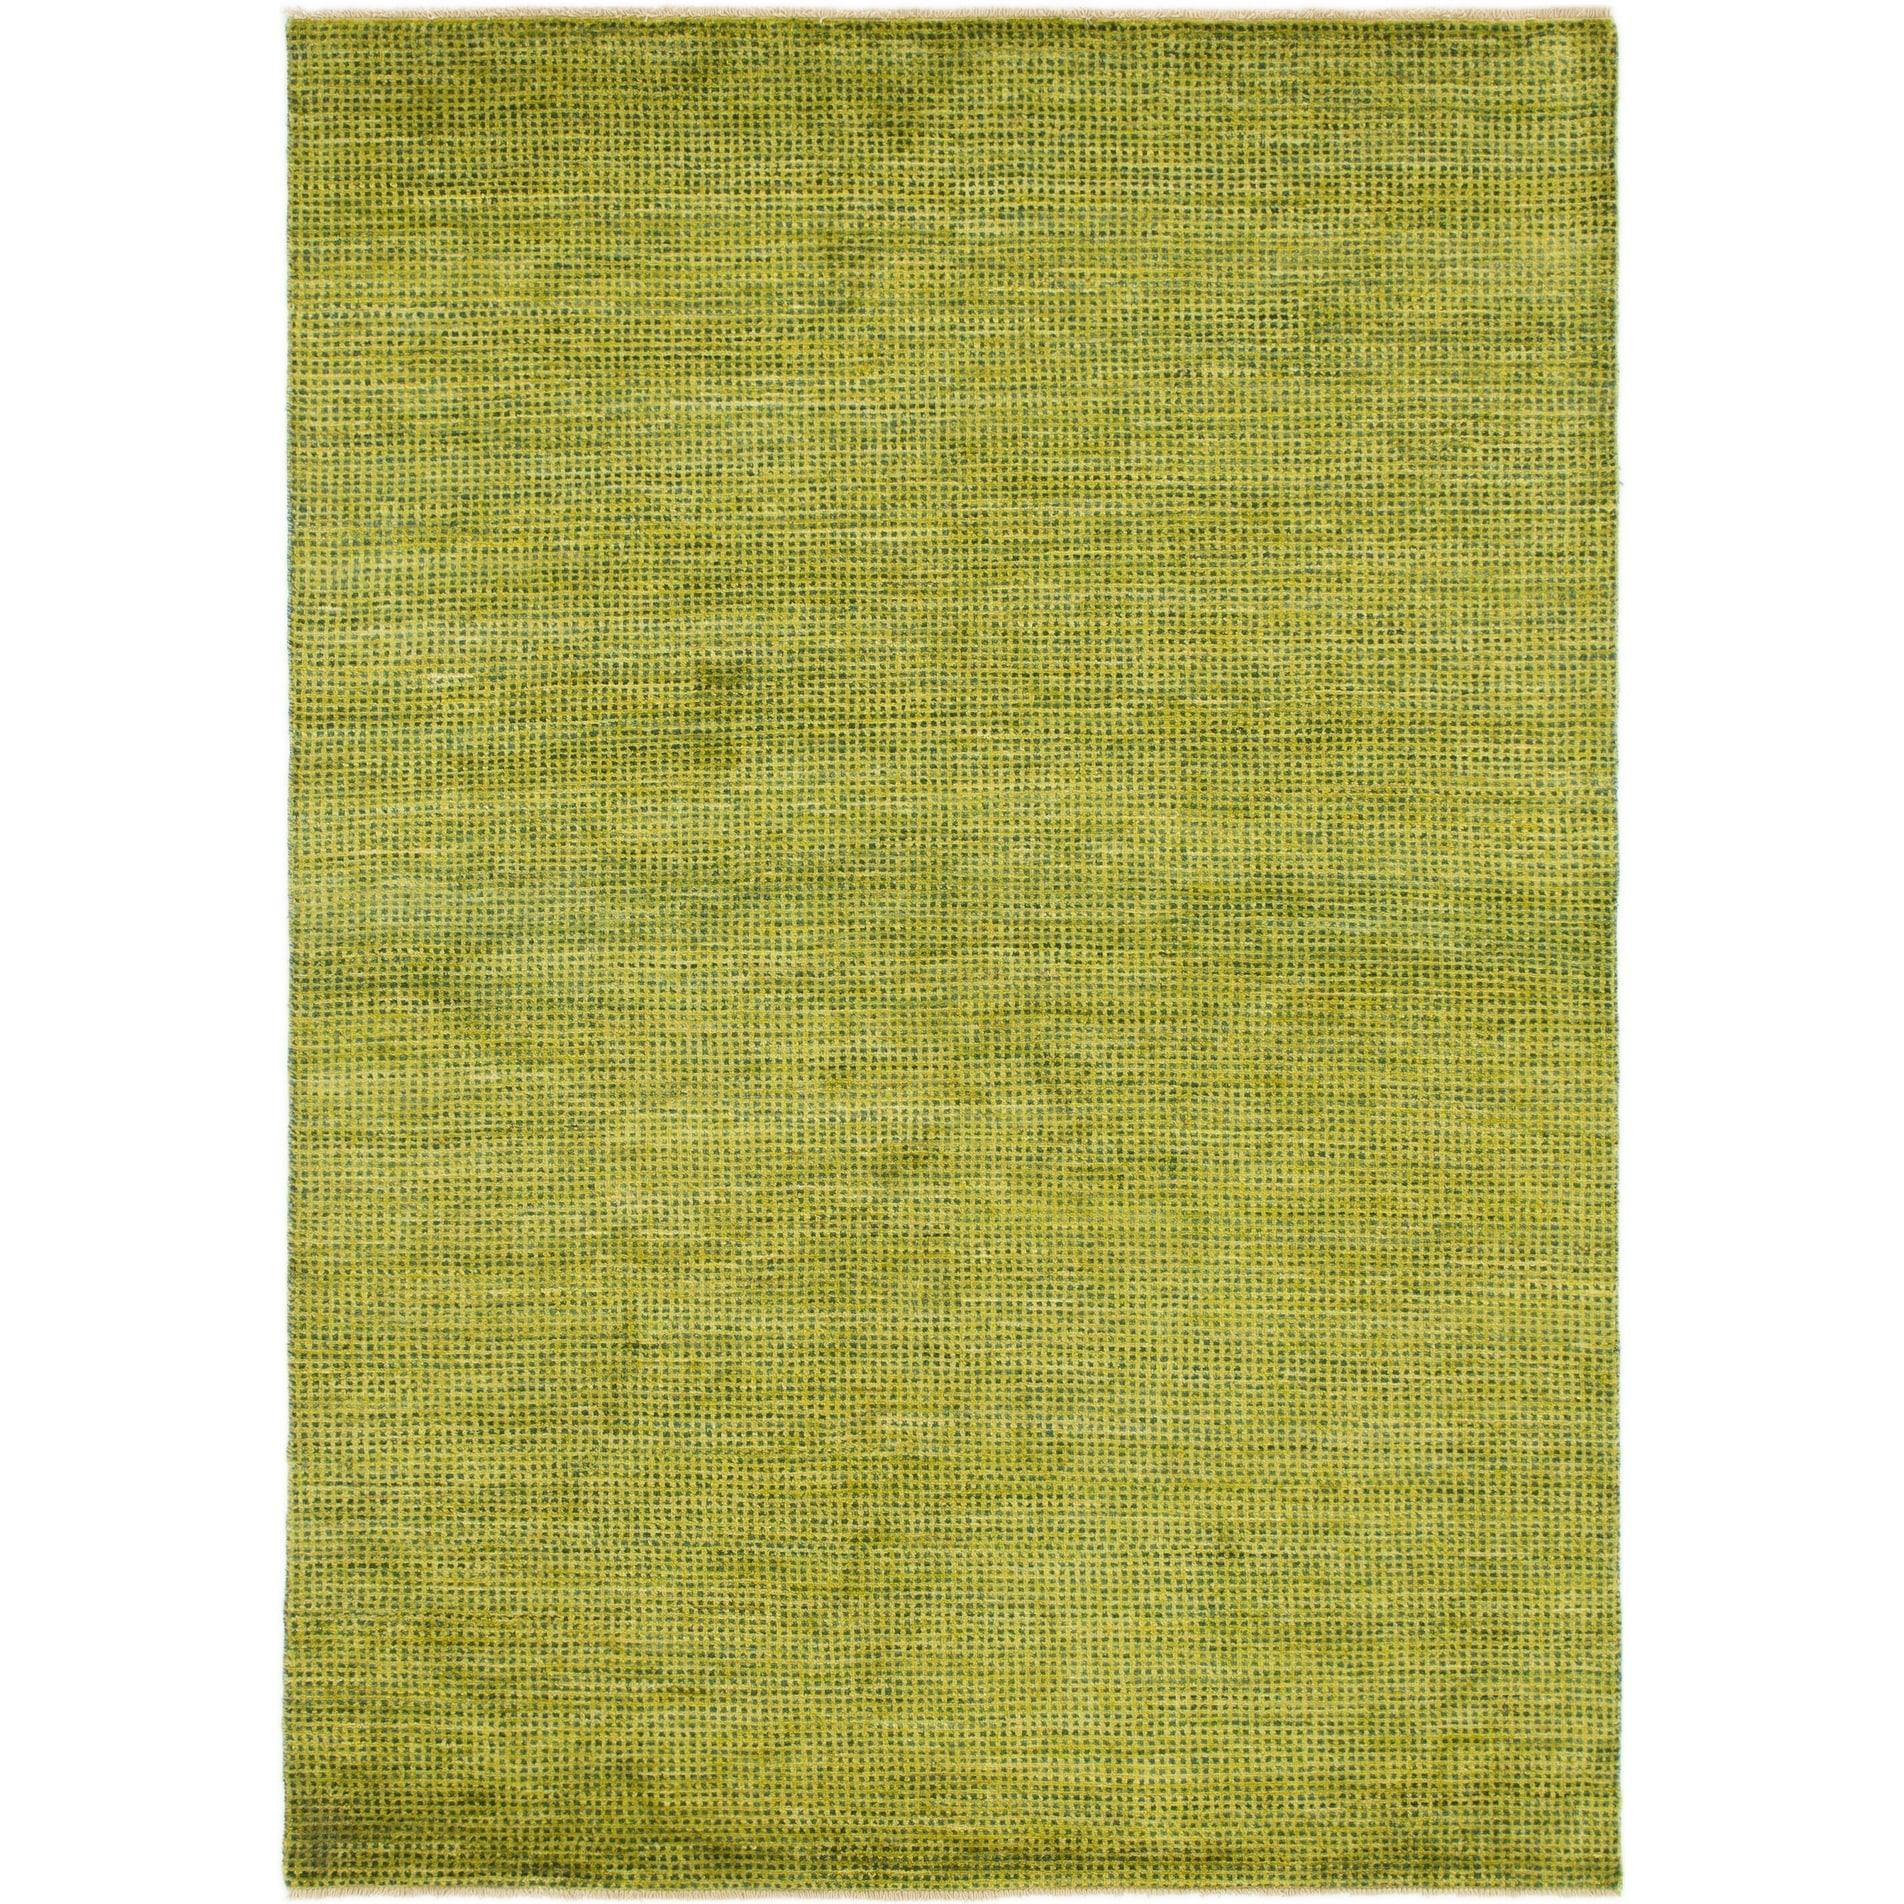 Hand Knotted Kashkuli Gabbeh Wool Area Rug - 5 7 x 8 (Green - 5 7 x 8)